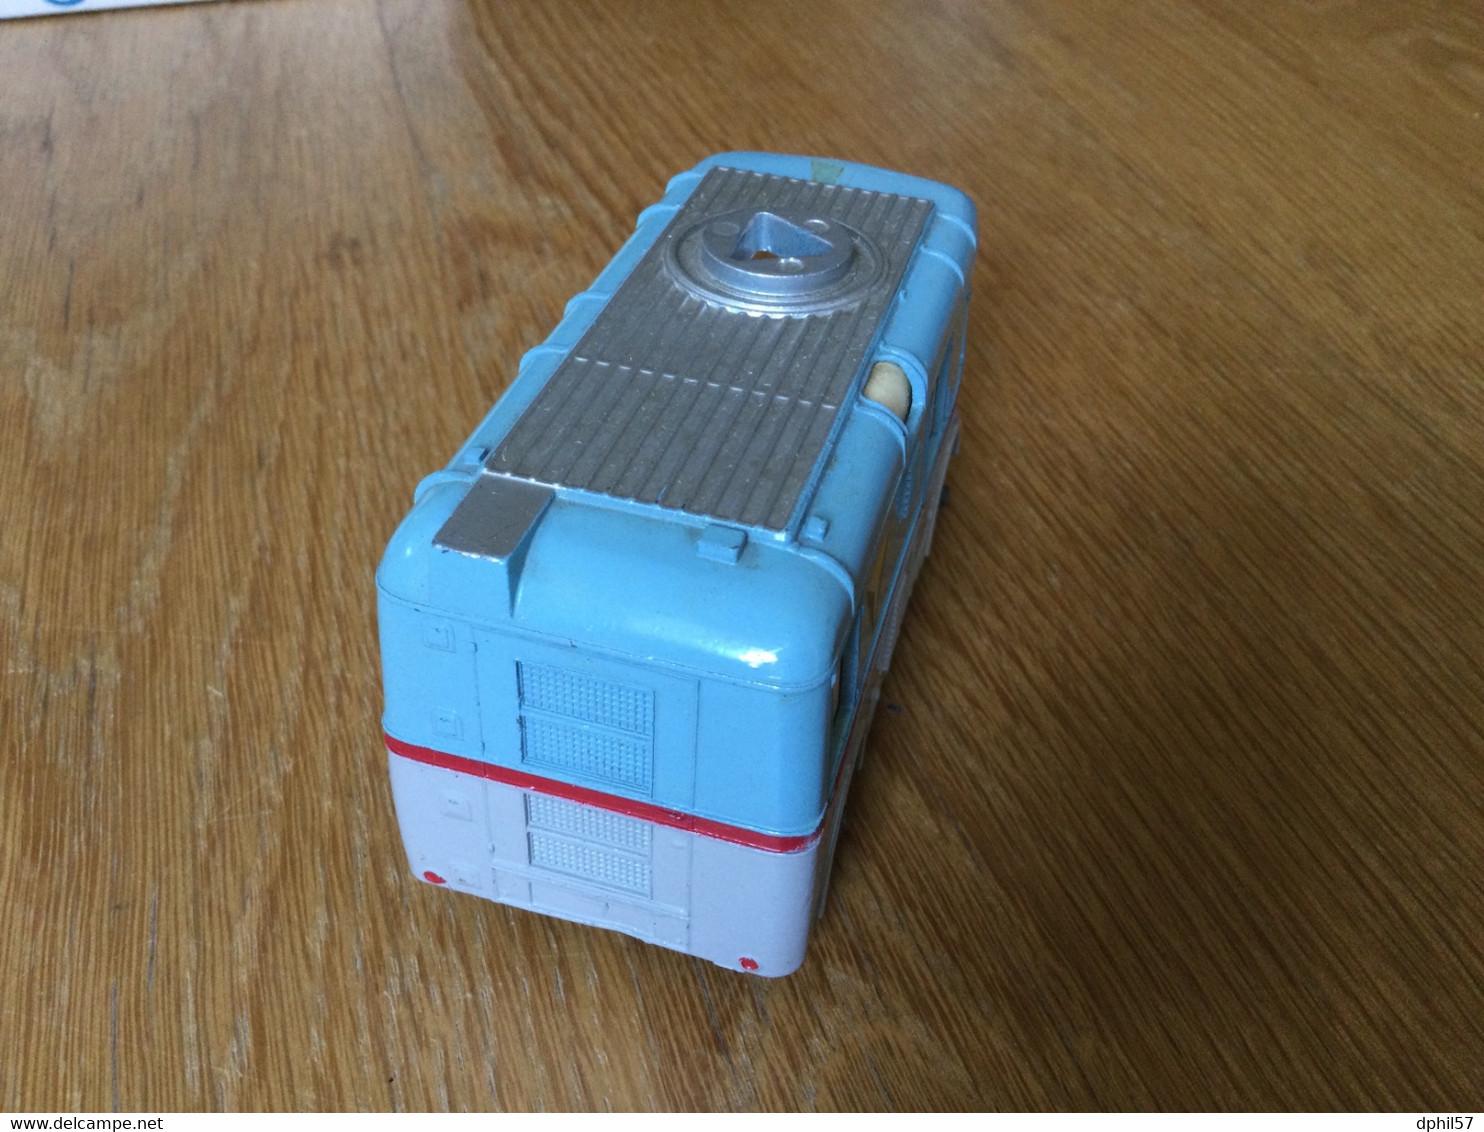 Ancien Véhicule Dinky-toys : ABC TV Transmitter Van (~1961) Avec Cameraman. Manque L'antenne - Toy Memorabilia